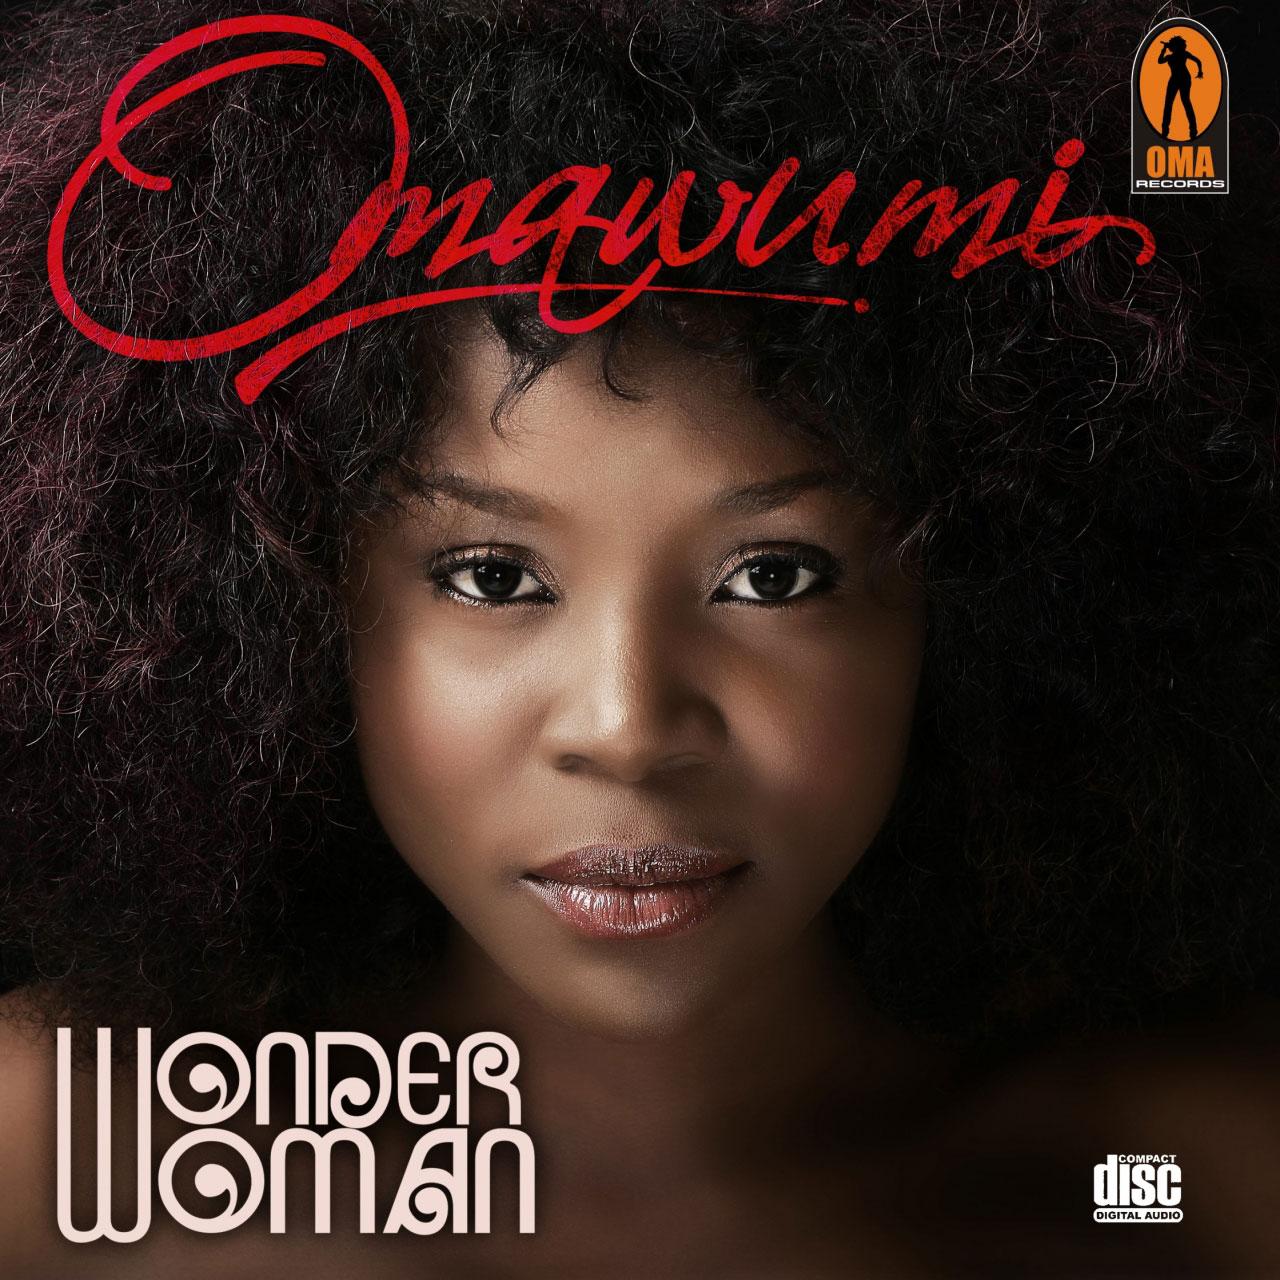 http://2.bp.blogspot.com/-hBDssrZVryo/TdtysLj8wPI/AAAAAAAAAHk/BdgucXcWpj8/s1600/omawumi-wonder-woman.jpg